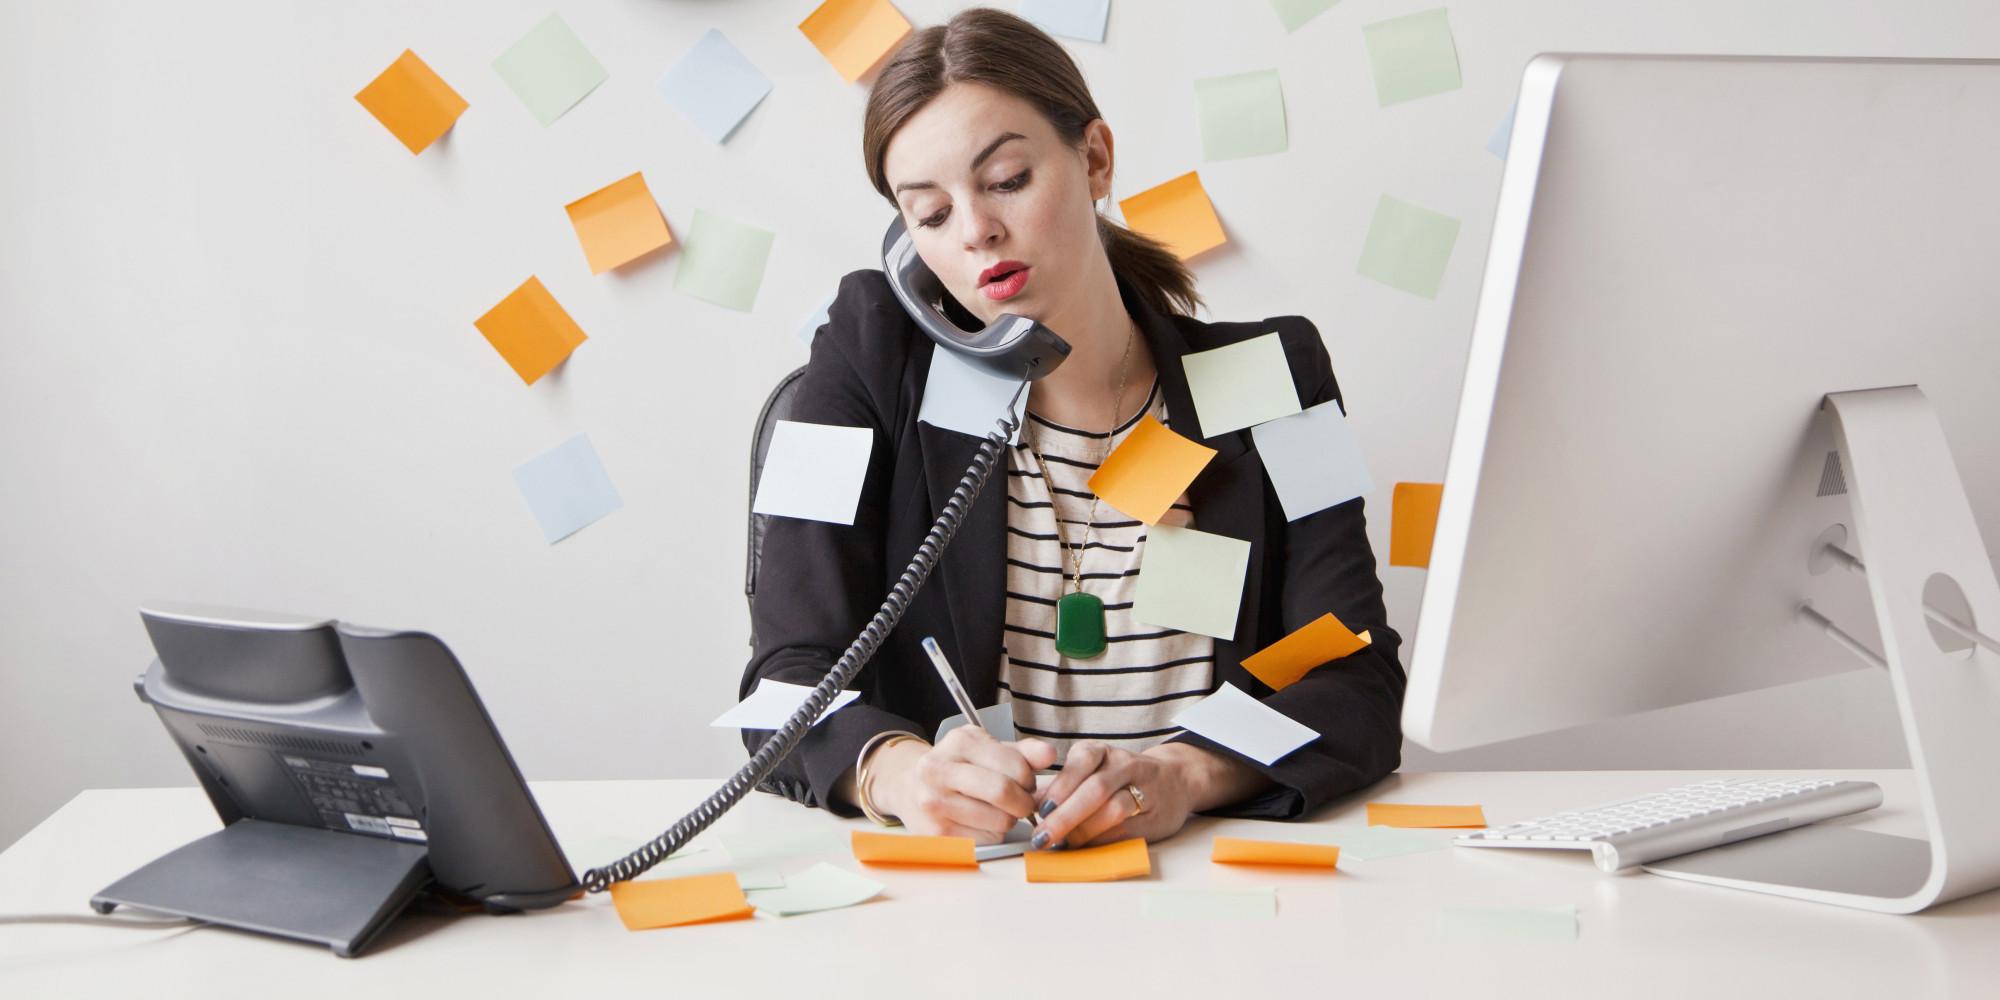 Learning skill uguf0153 stressedesserts factors of stress - Secretaresse witte ...